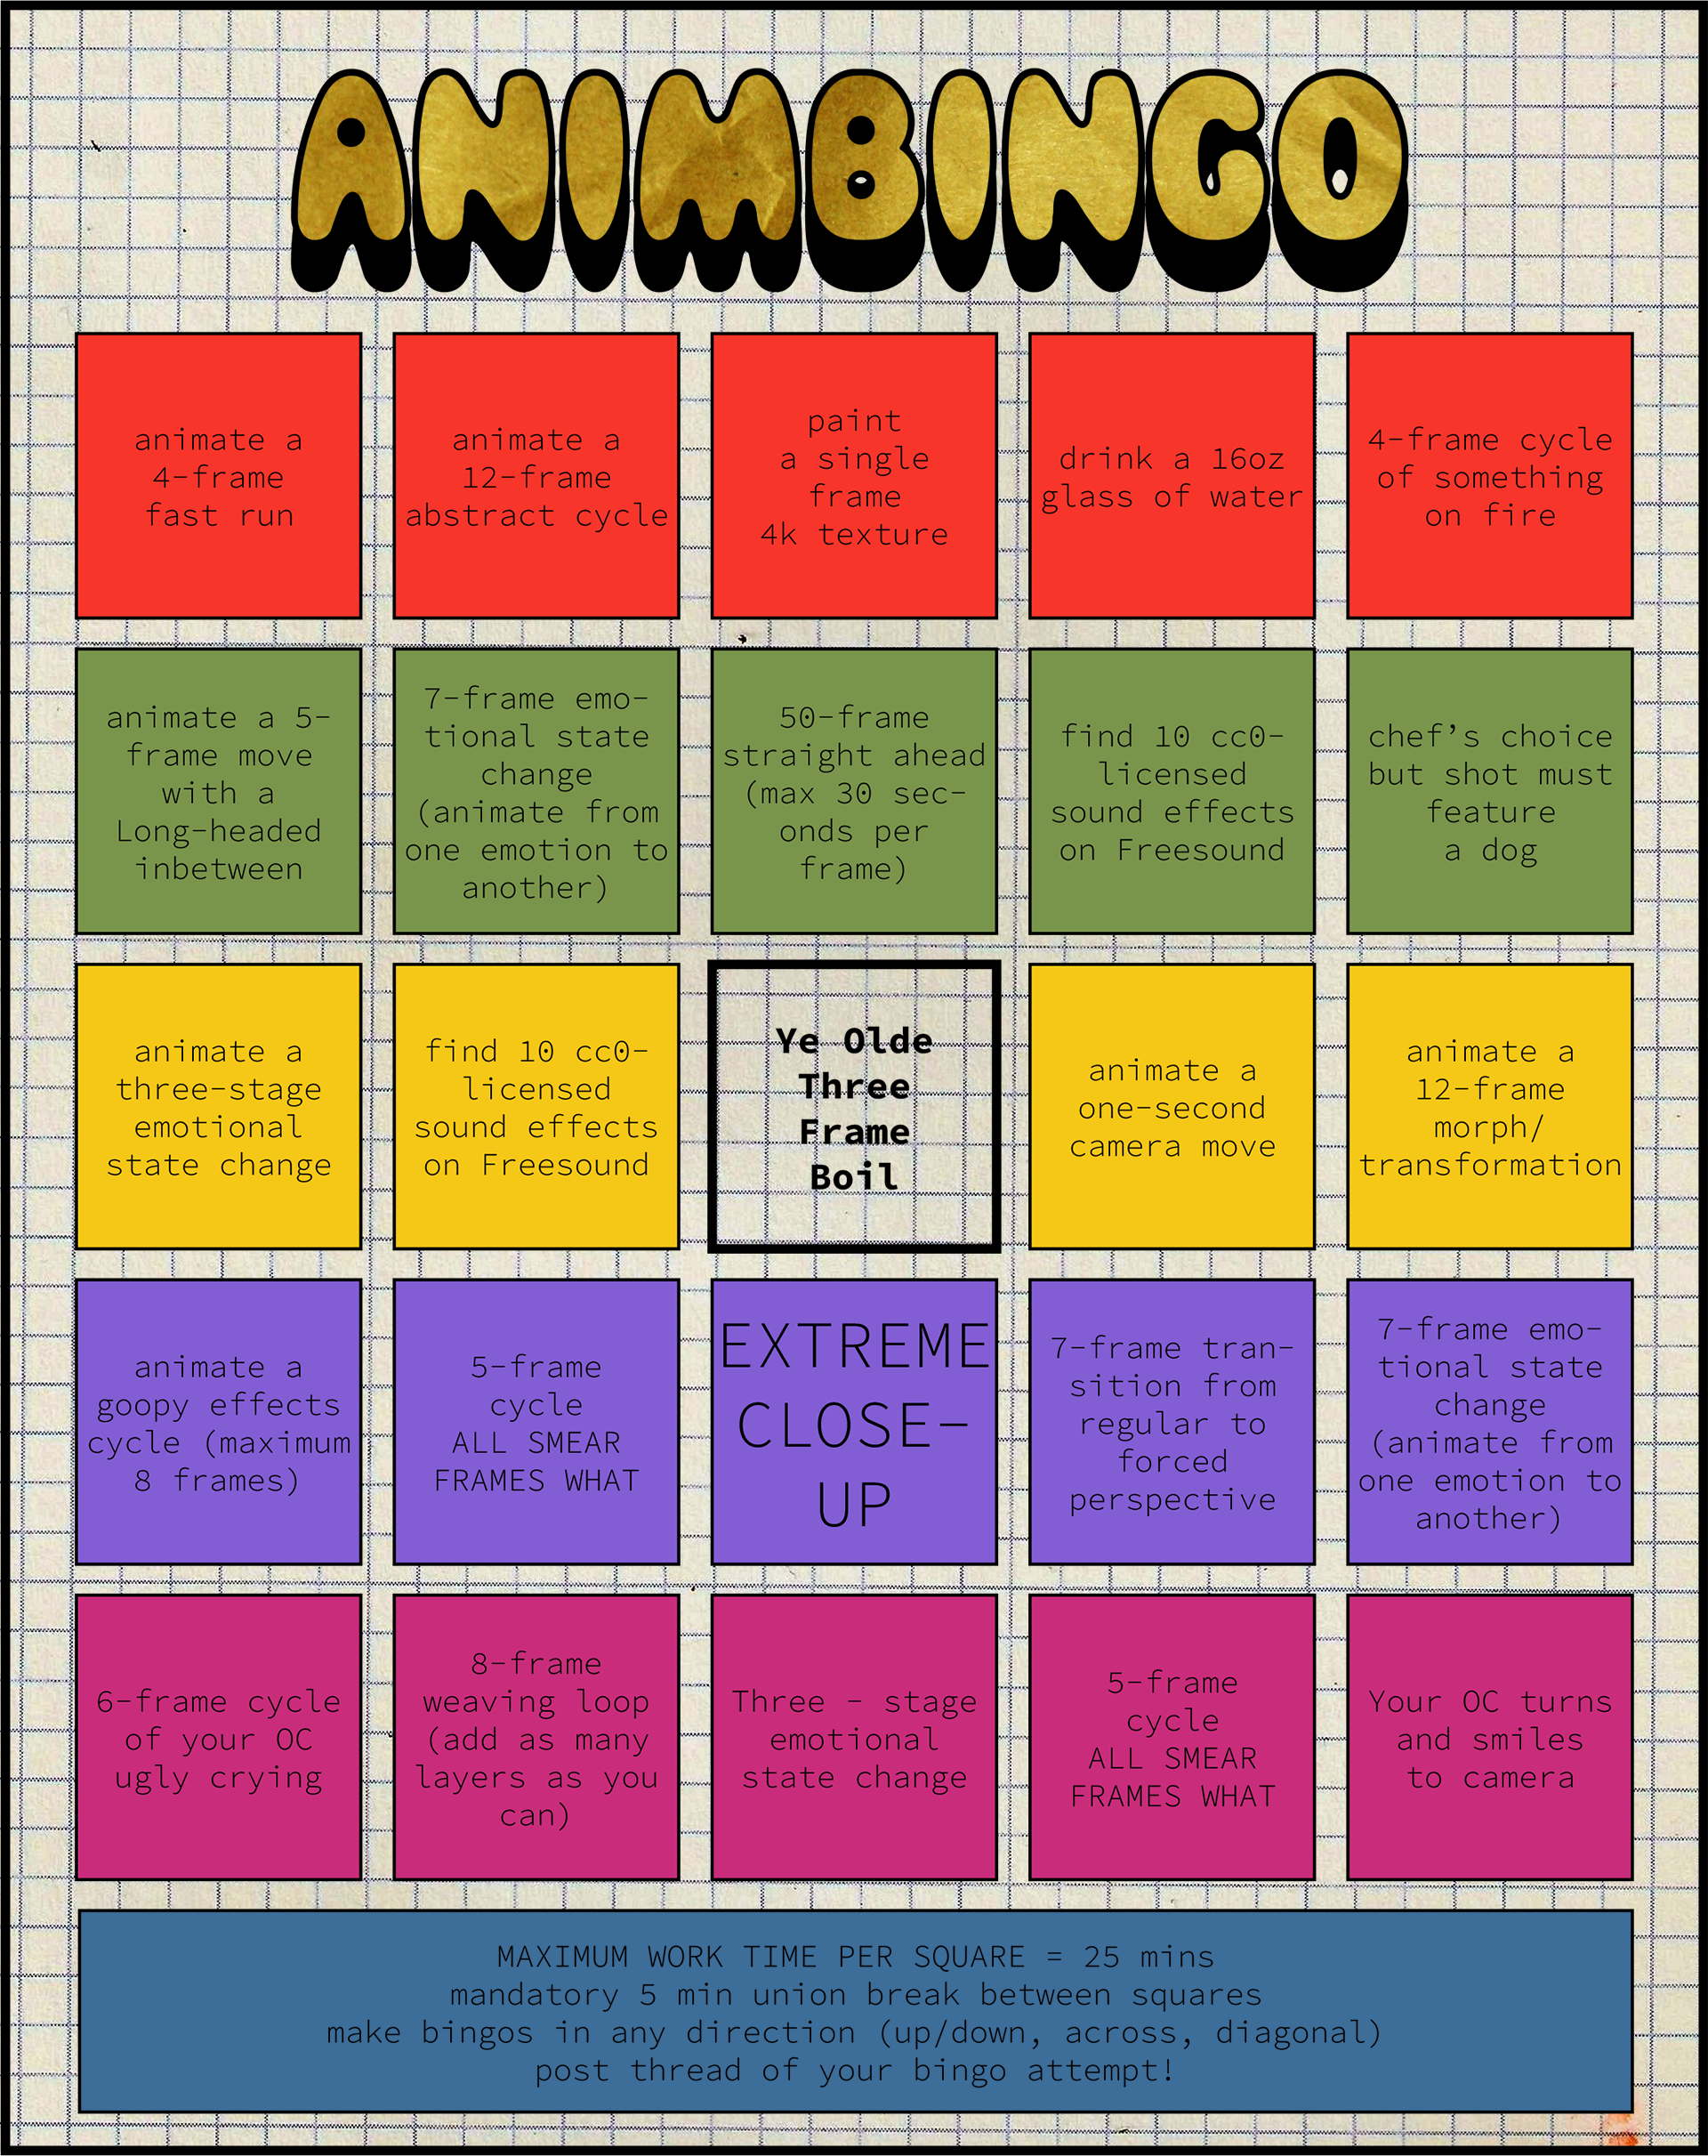 the animbingo board